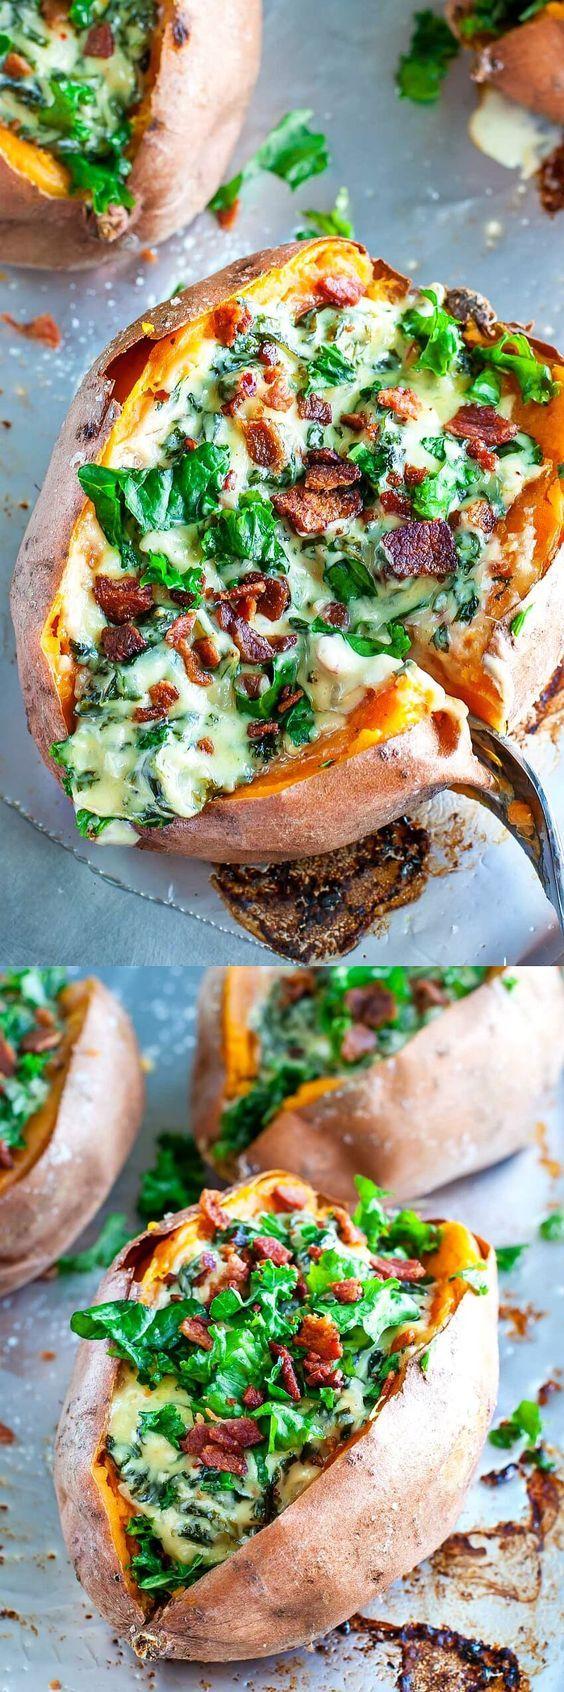 sweet potato - healthy recipe